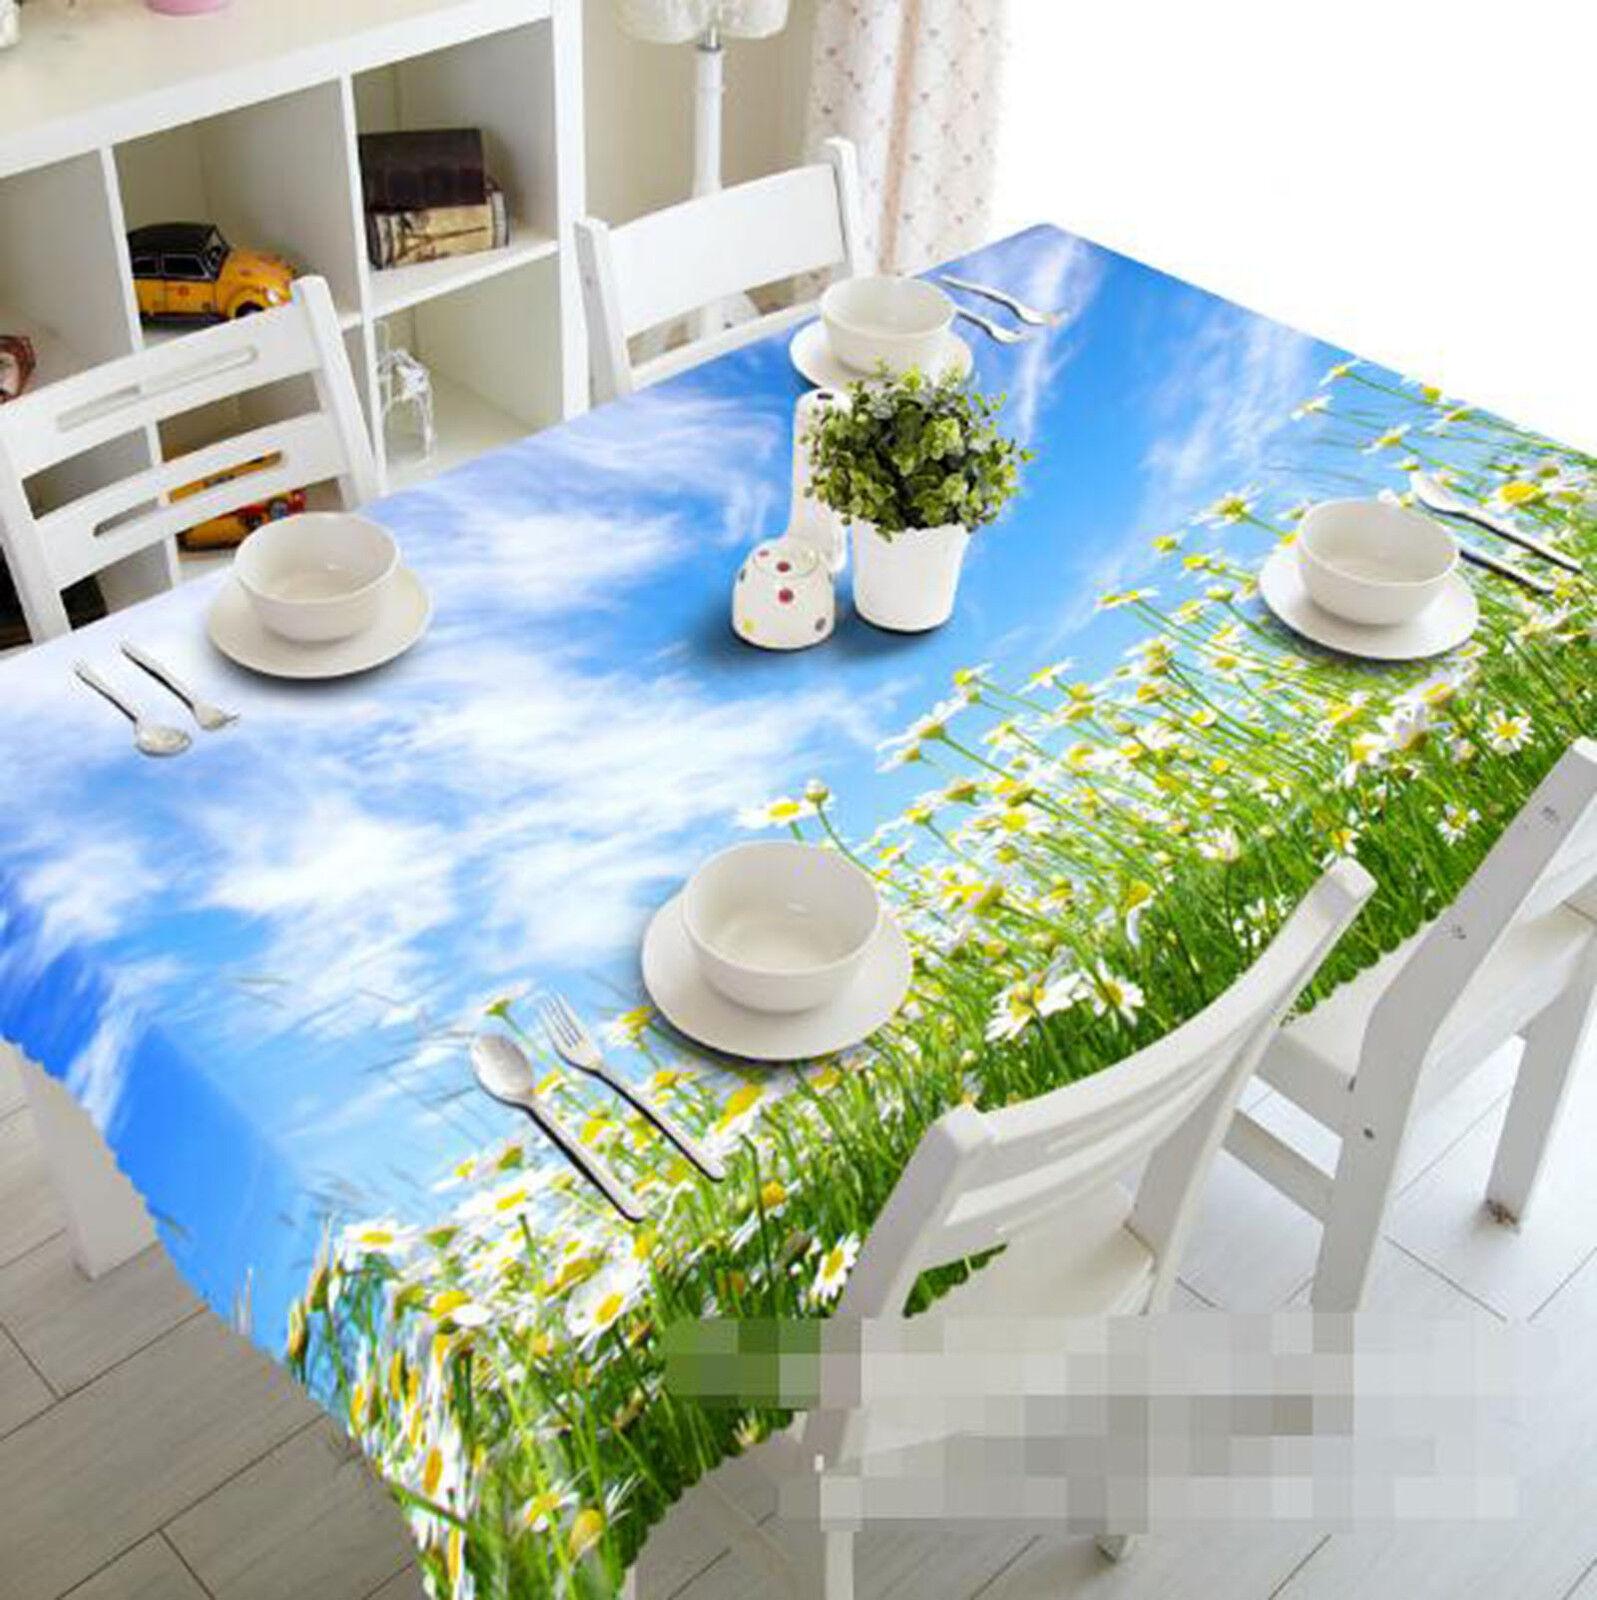 3d azulme 59 mantel mantel pañuelo fiesta de cumpleaños event AJ wallpaper de